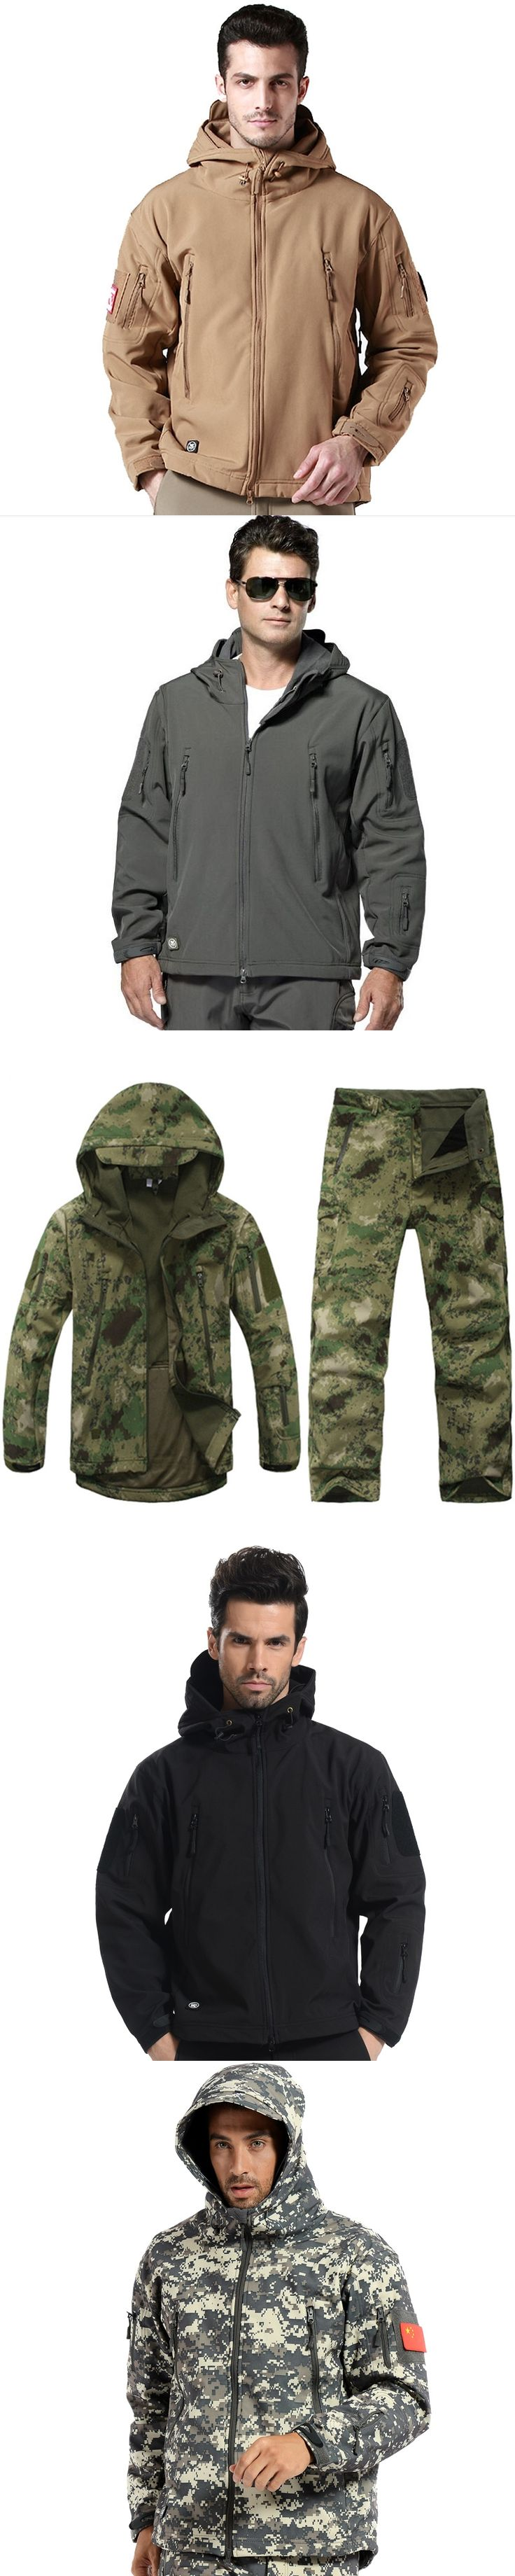 TAD V4.0 Gear Camouflage Shark Outdoor Waterproof Hiking Jacket Suit Men Army Hunting Set Military Hoody Softshell Jacket+ Pants